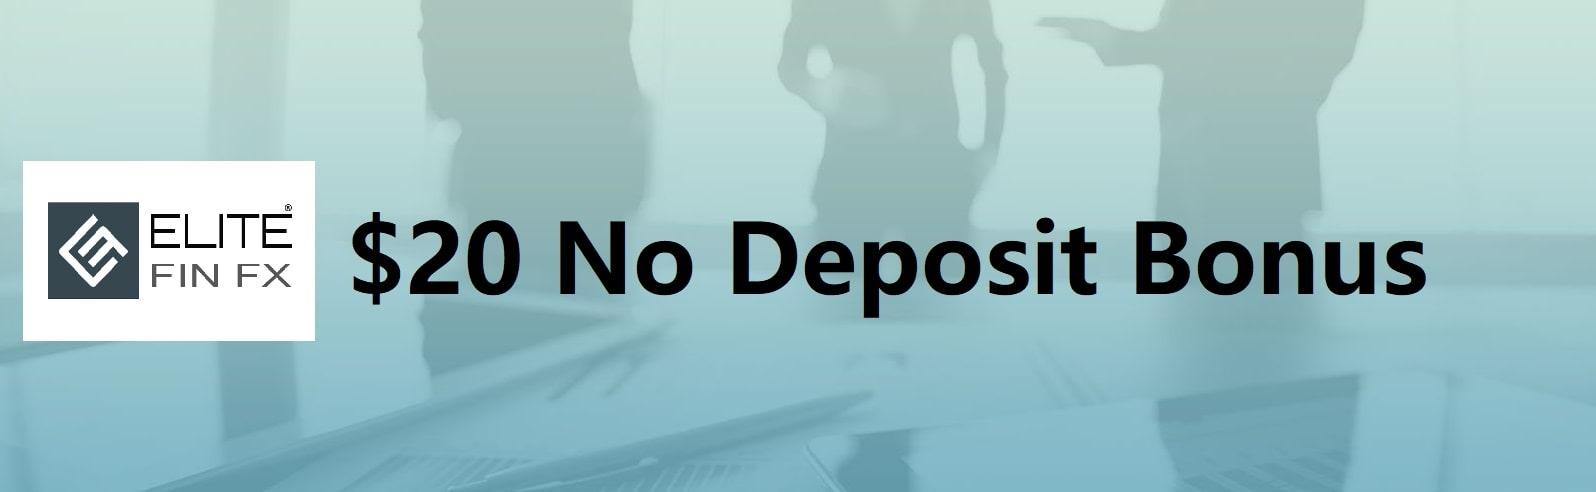 No Deposit Bonus– EliteFinFX